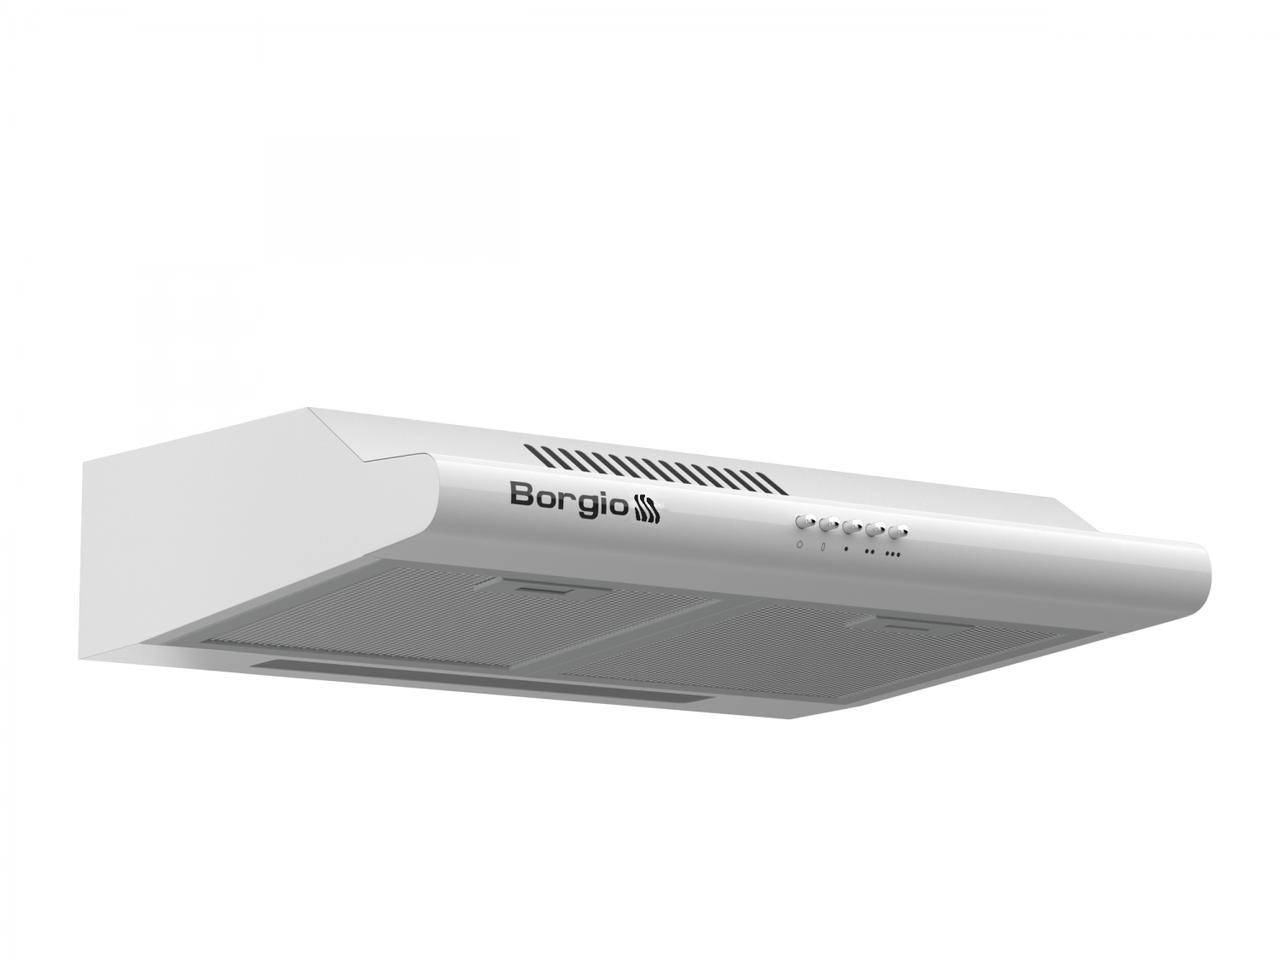 Кухонна витяжка плоска біла BORGIO Gio 60 white